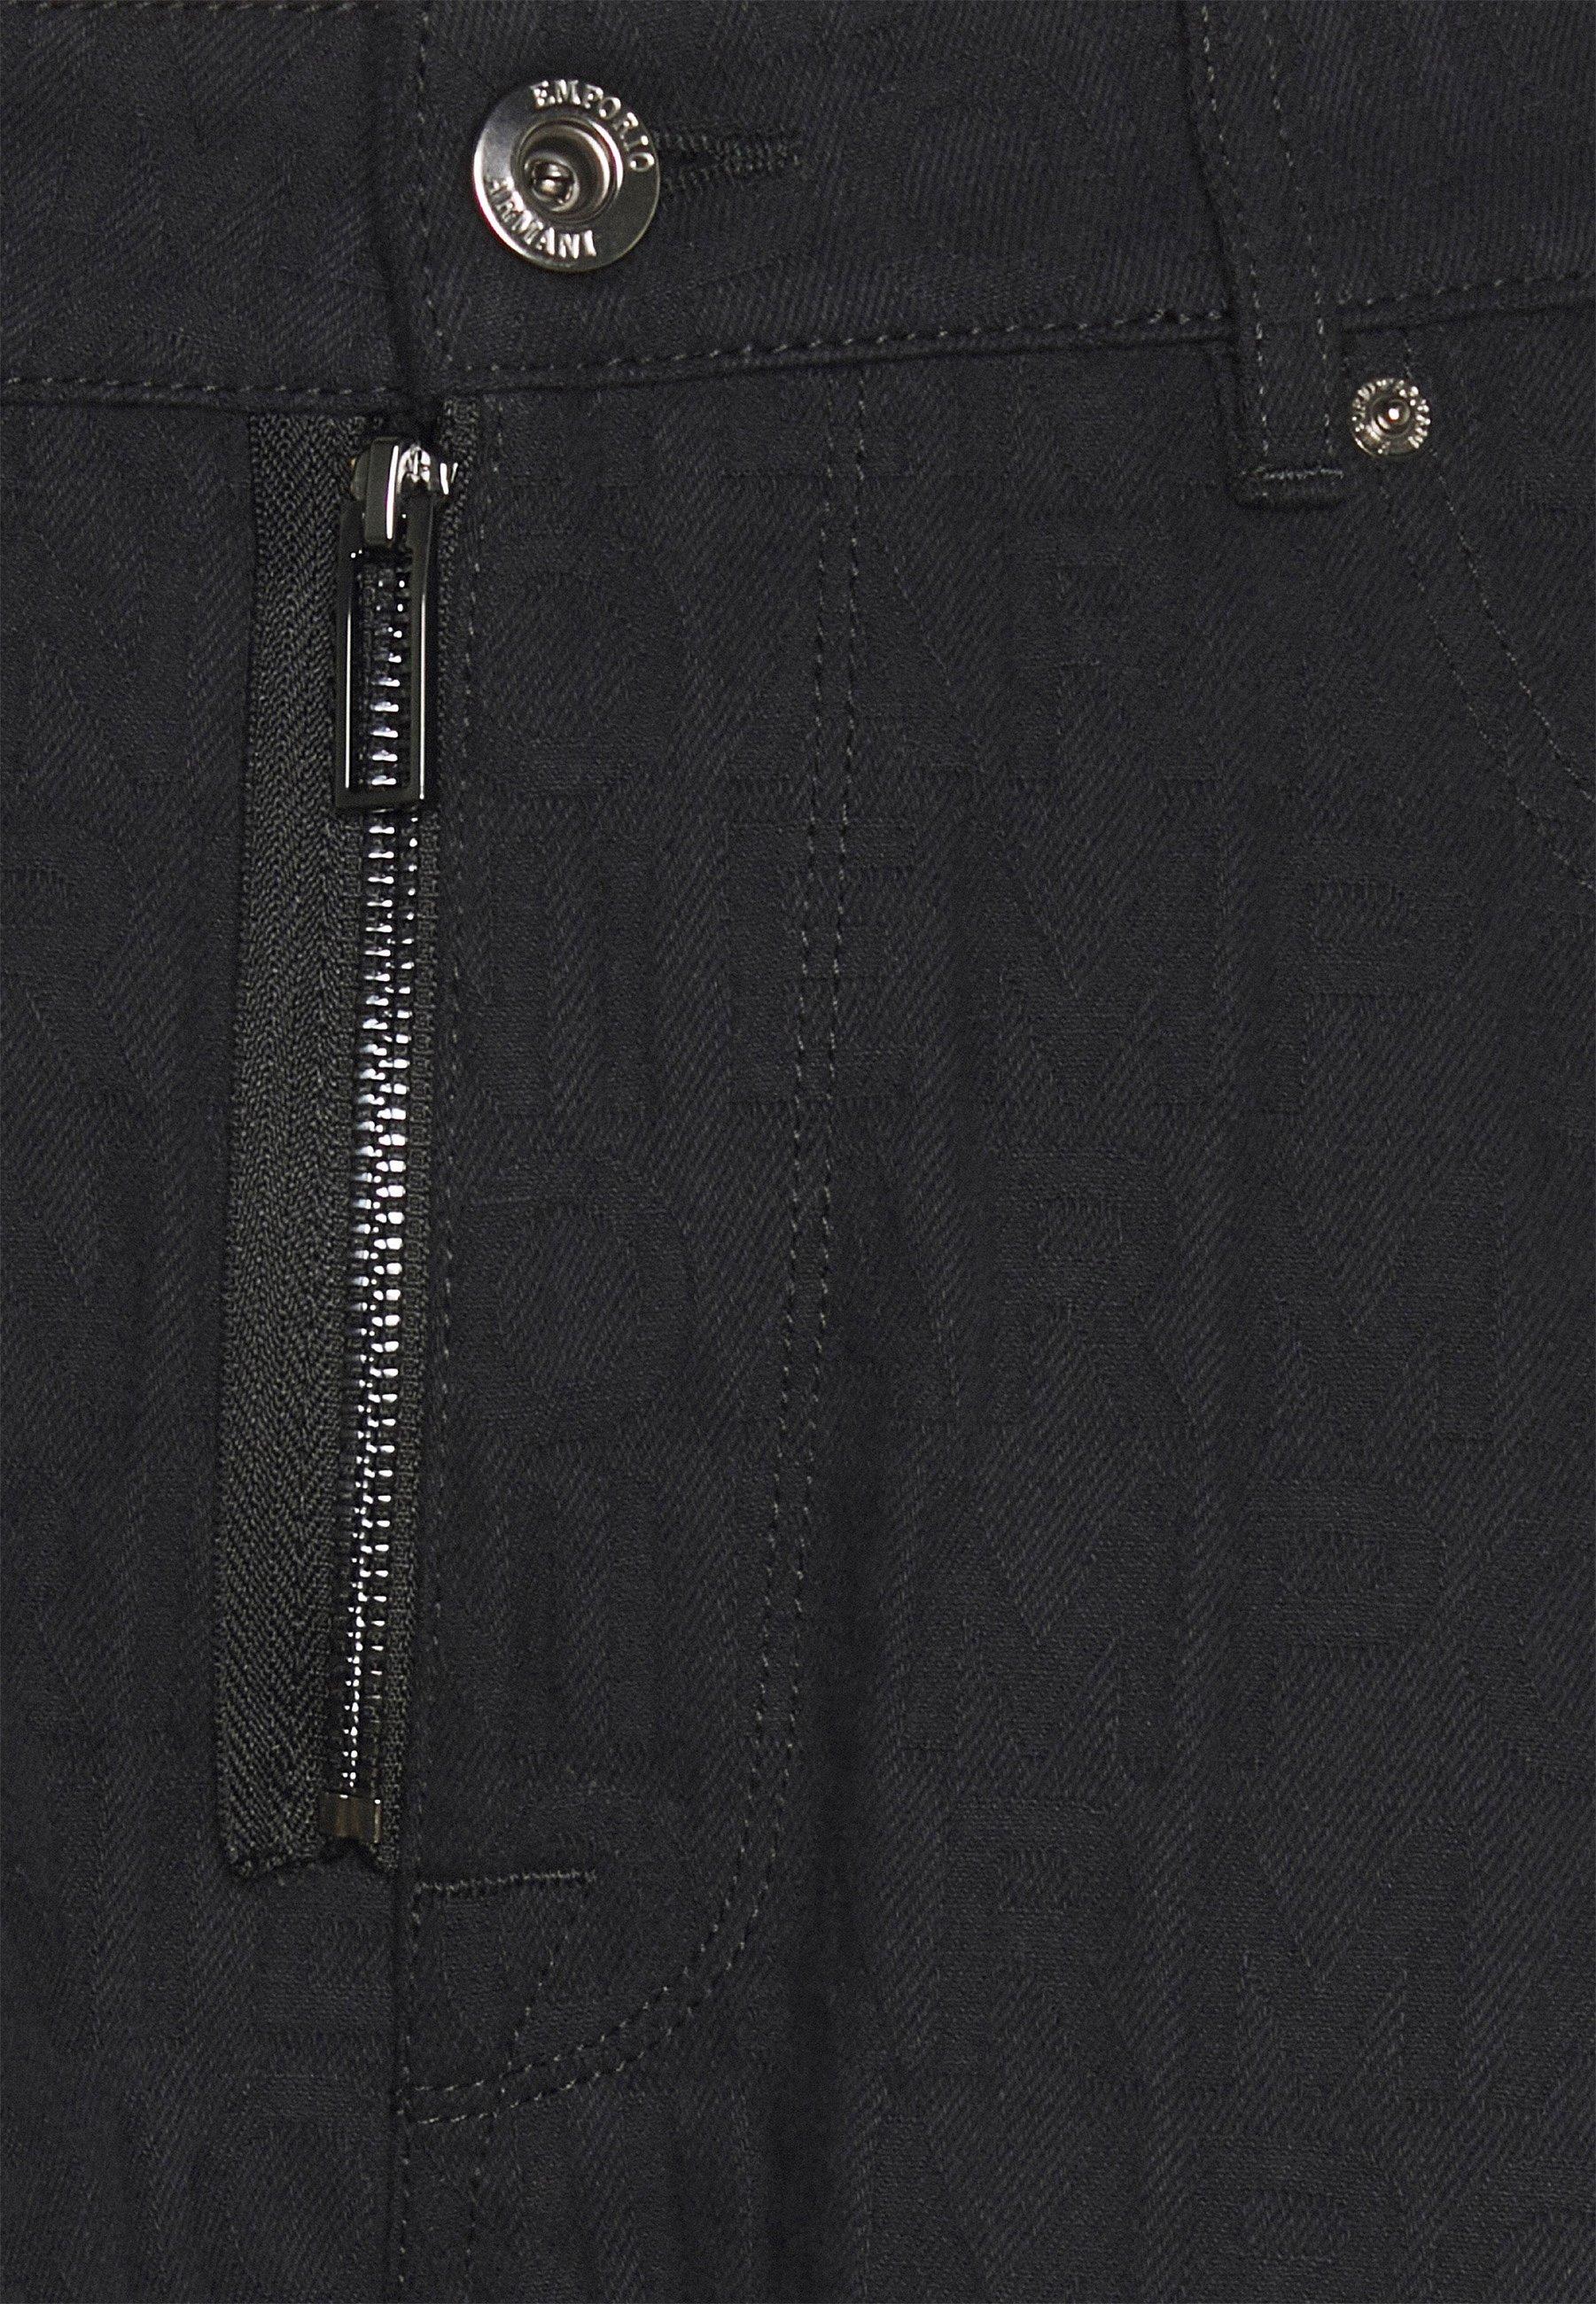 Uomo 5 POCKETS PANT - Pantaloni